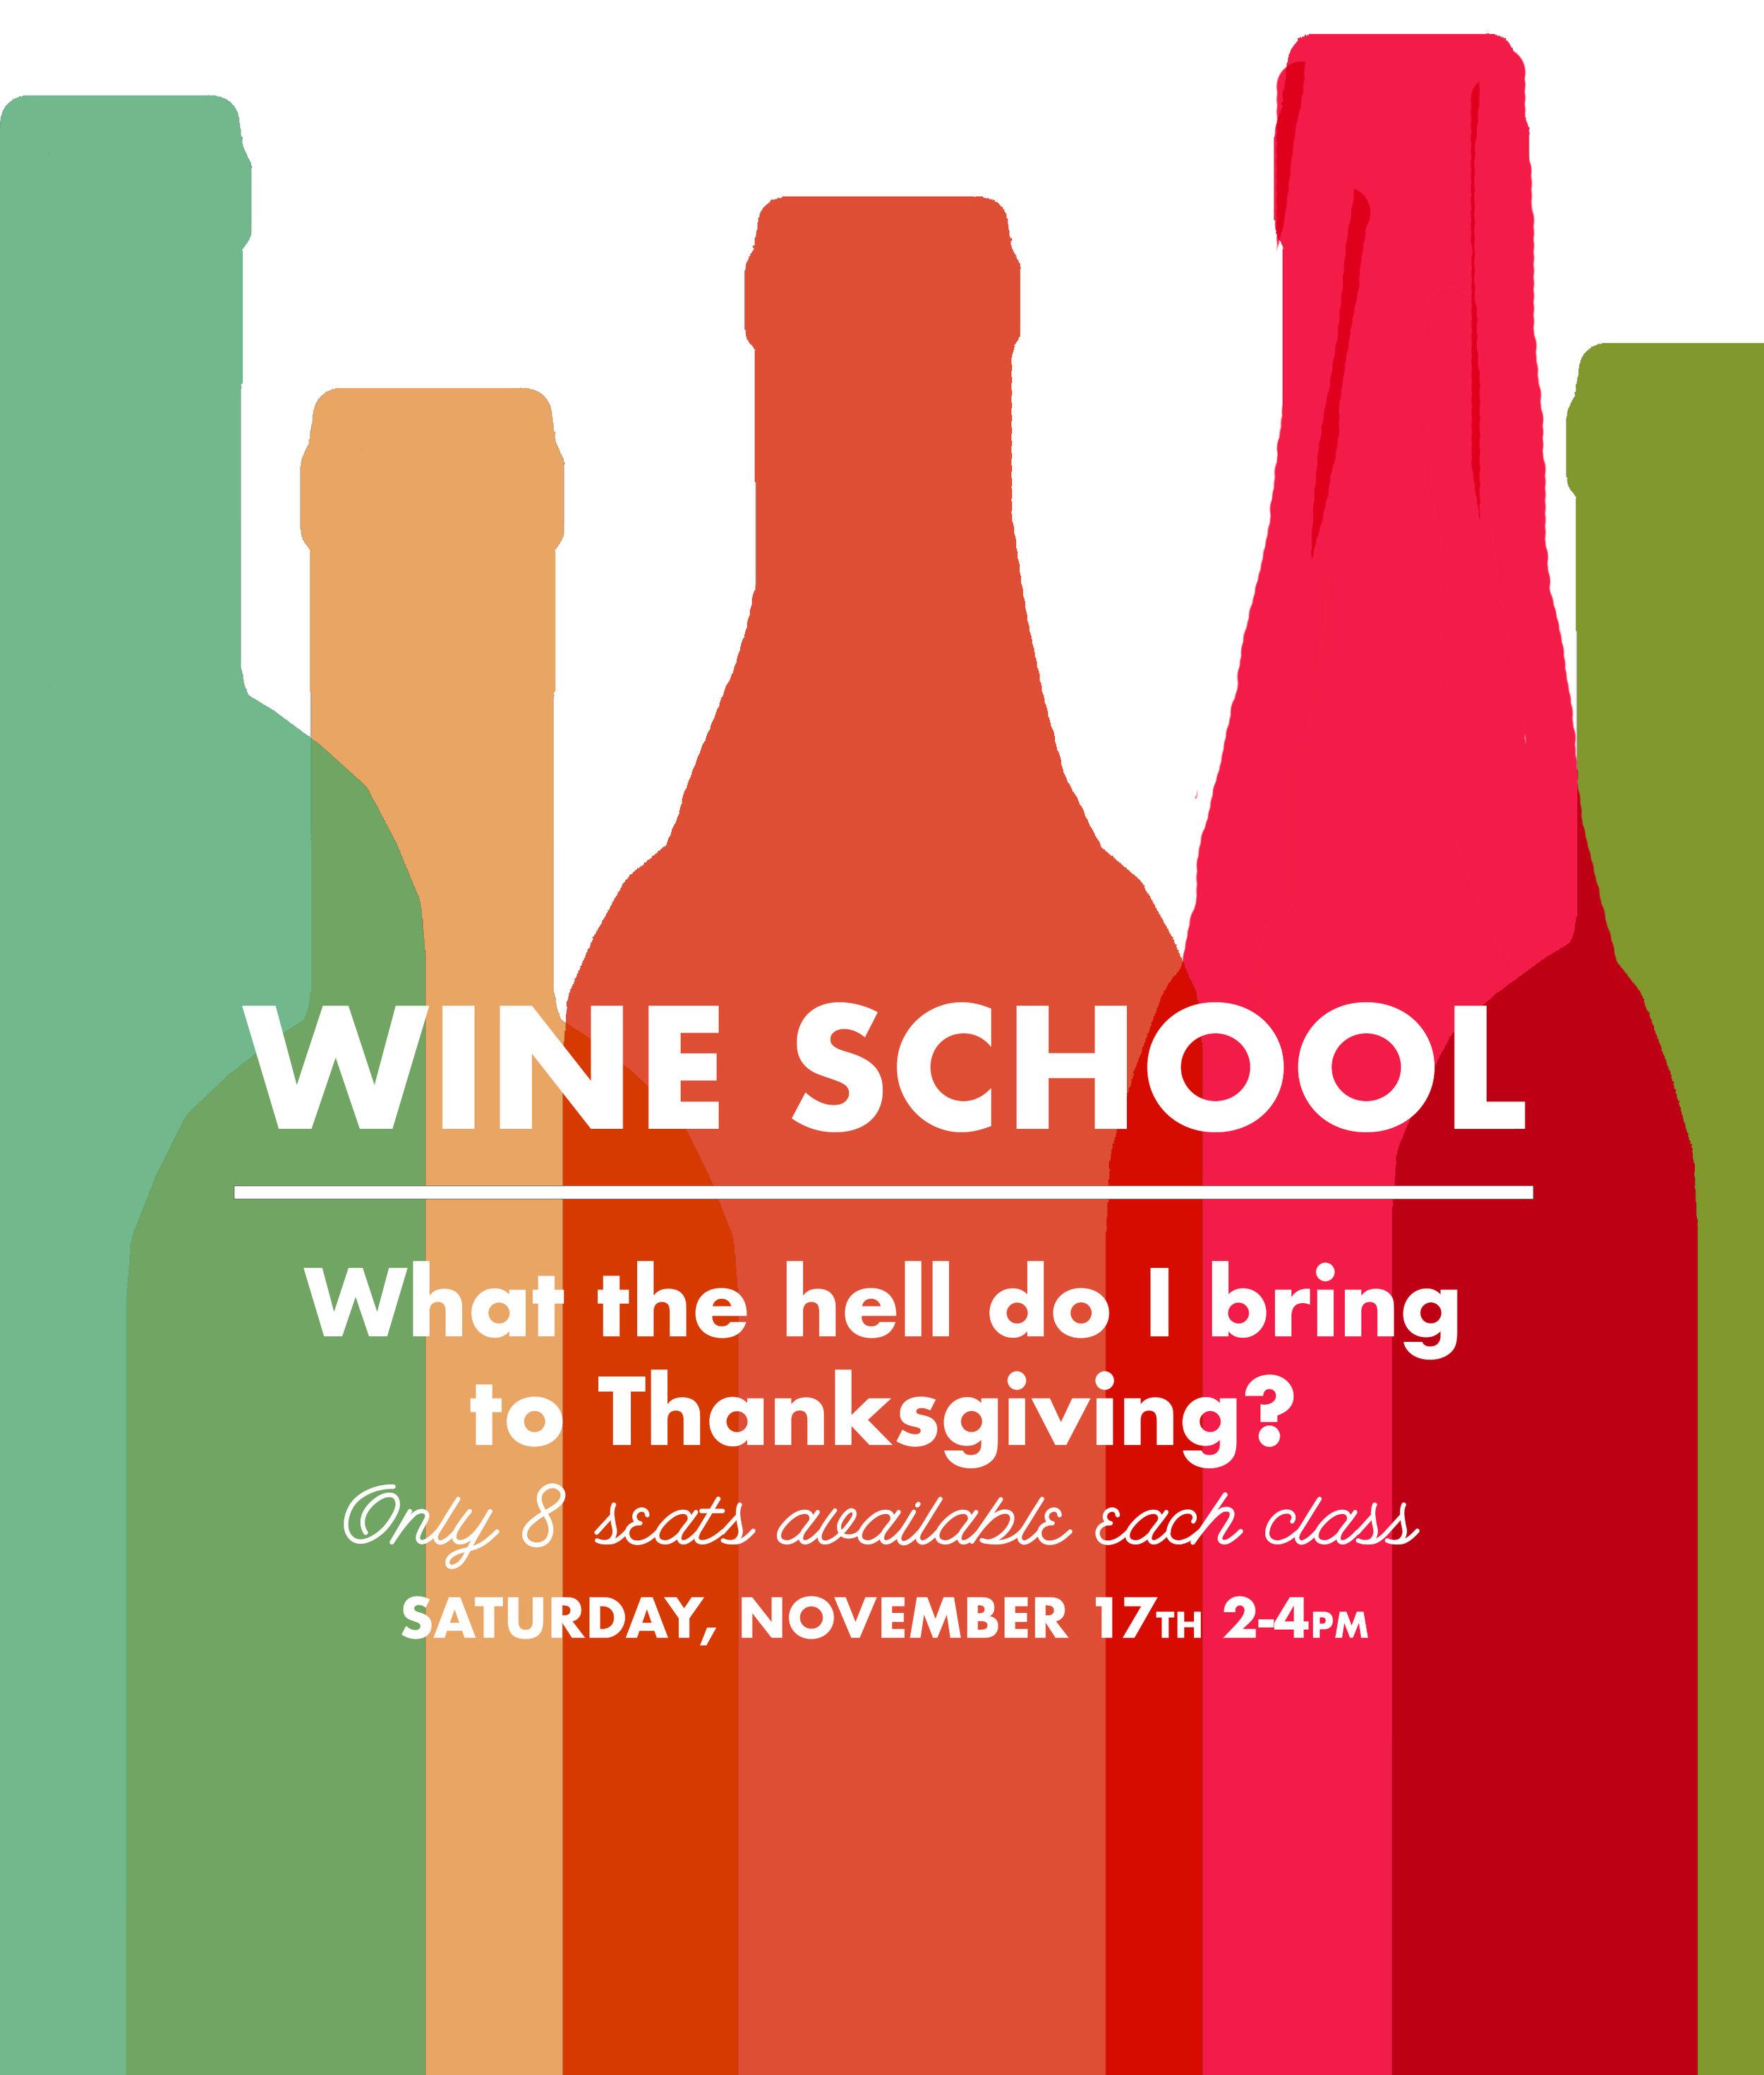 WINE SCHOOL THANKSGIVING.jpg